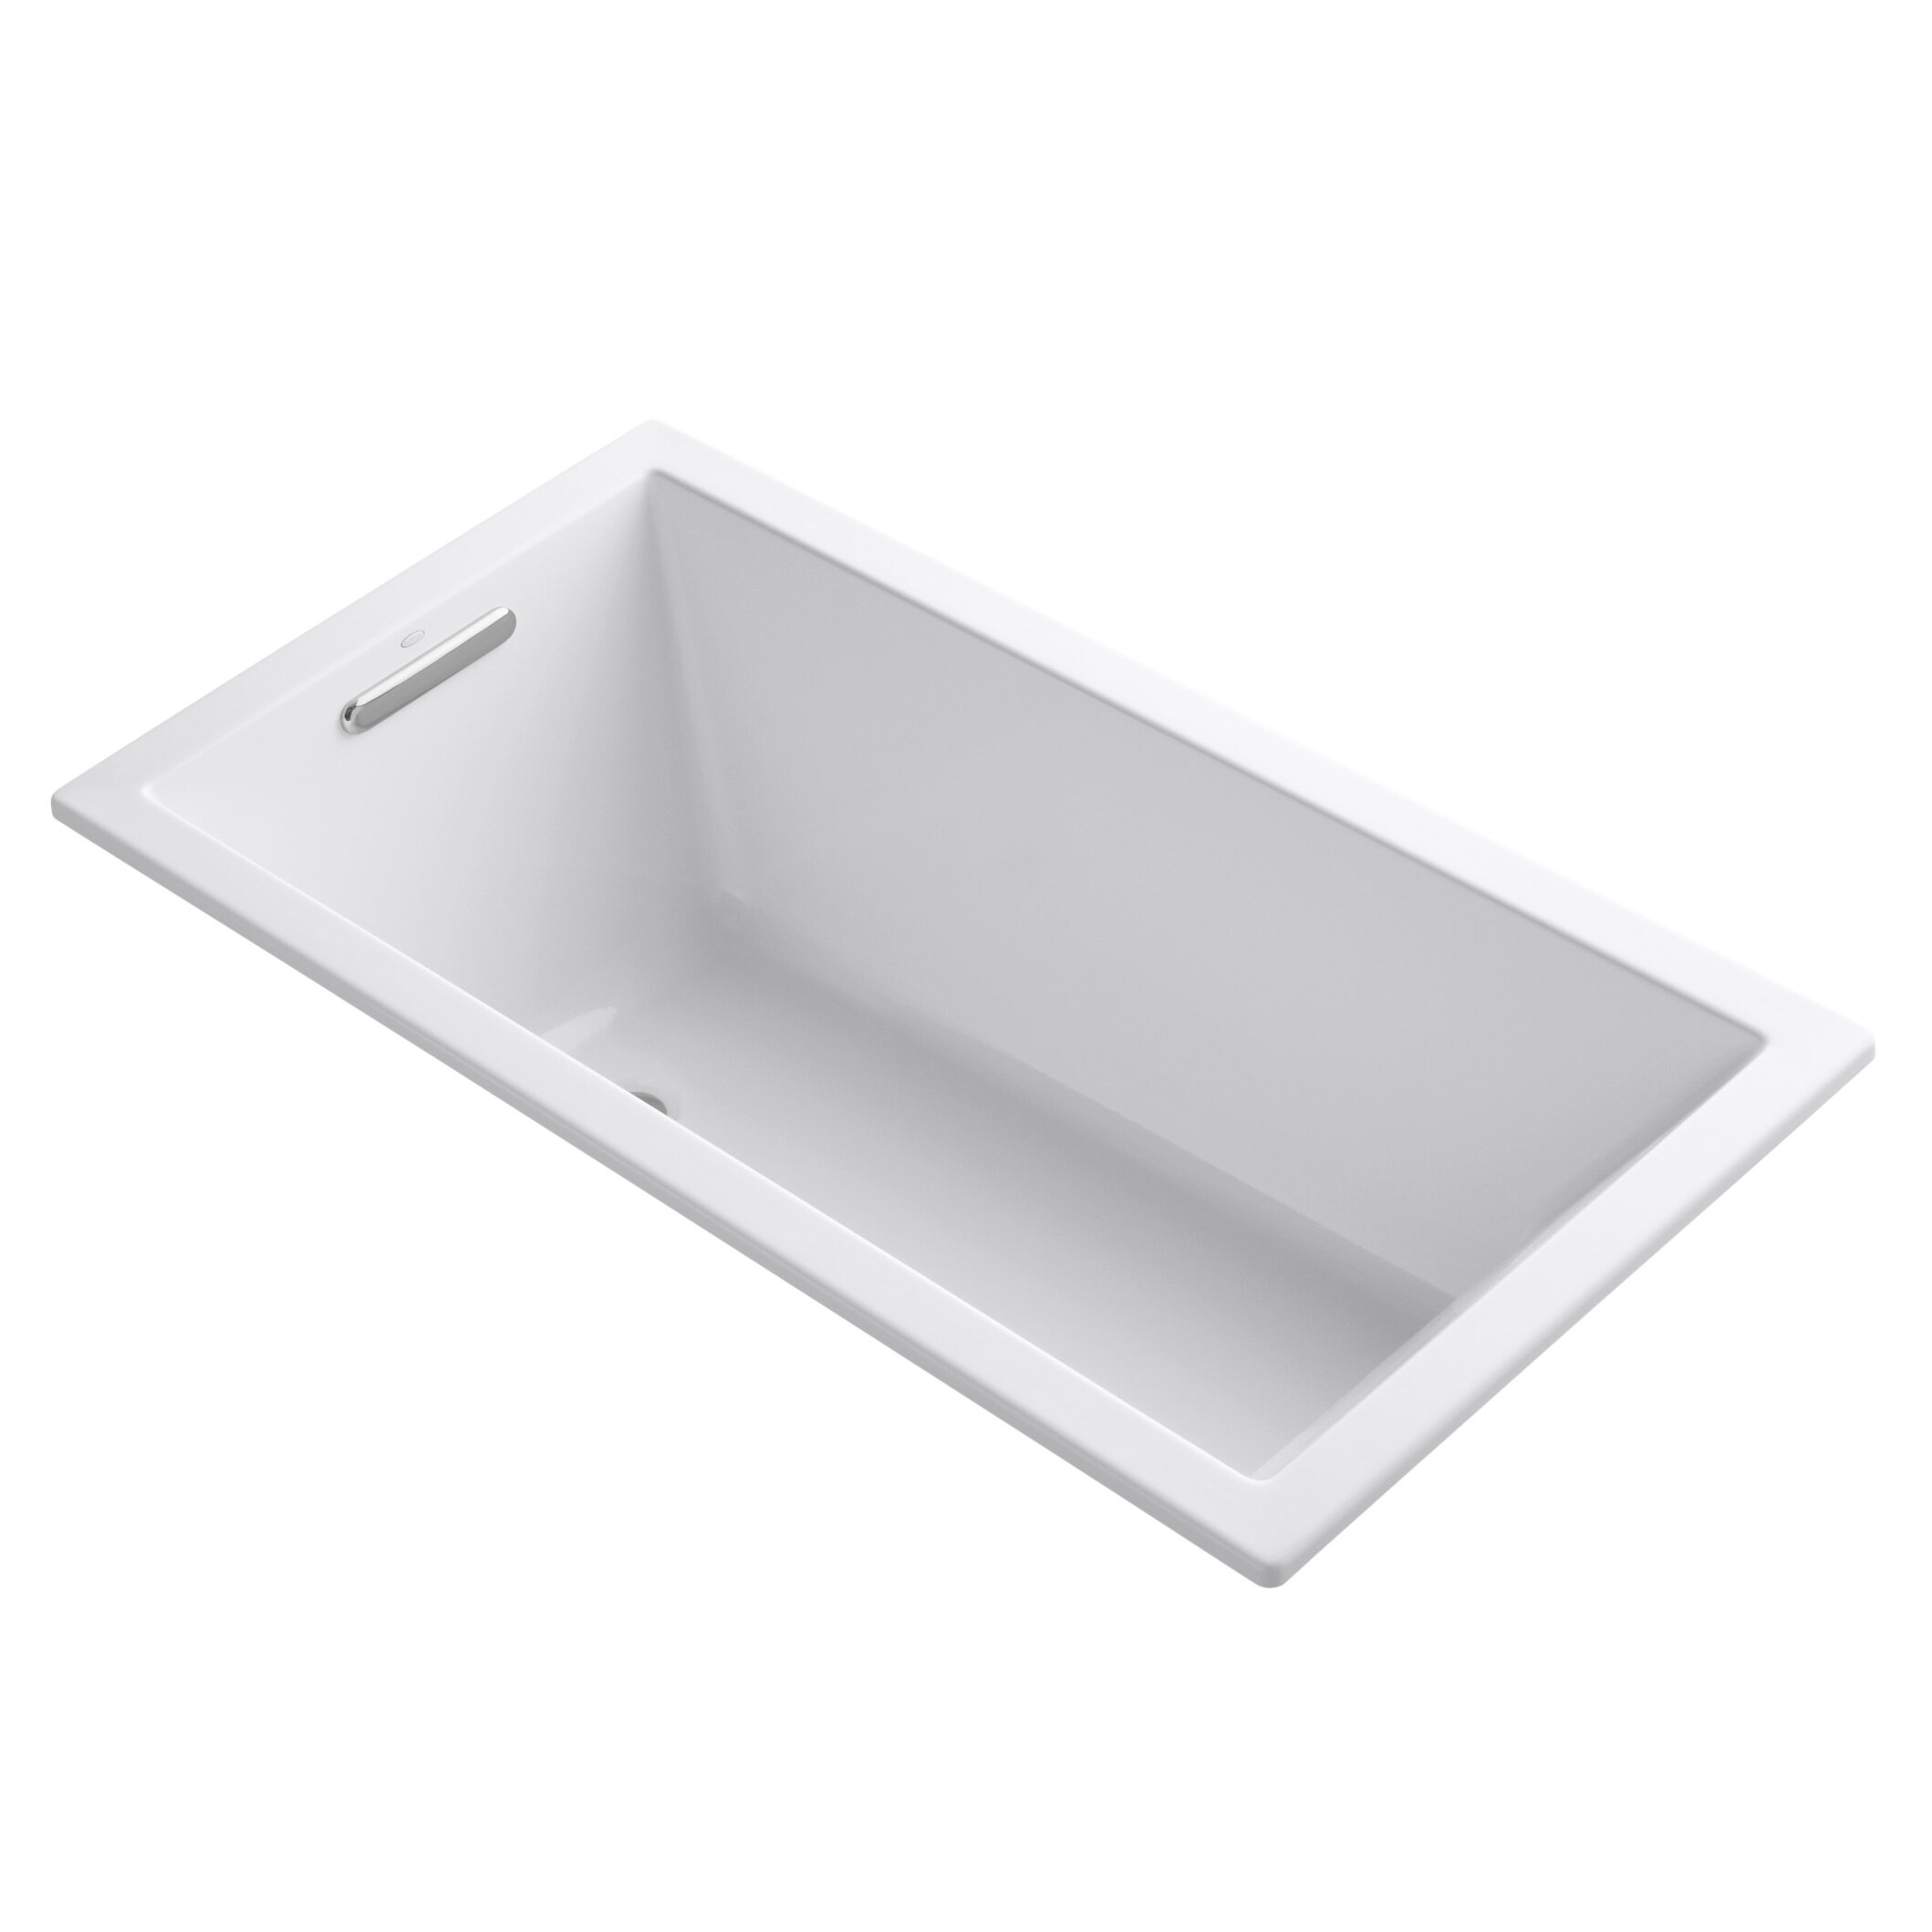 bathtubs ideas and design me with lowes contemporary replacement metal bathroom villager bath flashing photogiraffe backsplash bathtub as pics tub kohler style